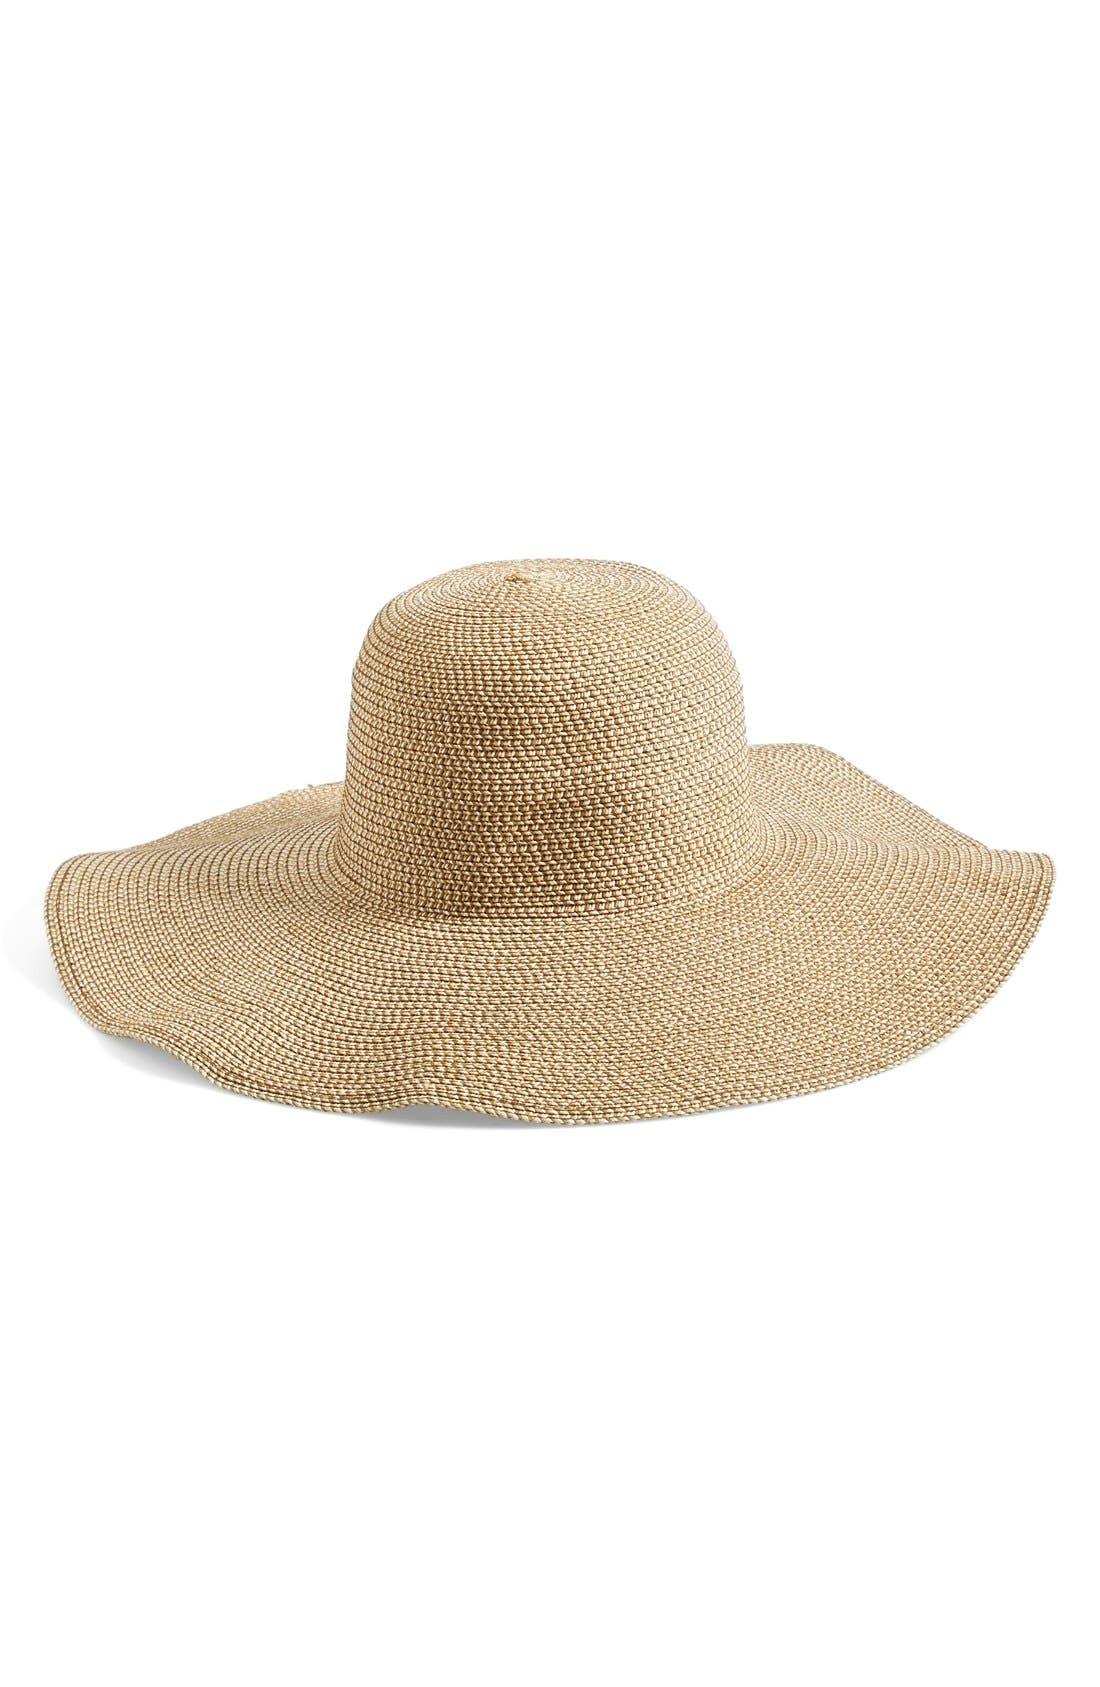 BP., Floppy Straw Look Hat, Main thumbnail 1, color, NATURAL